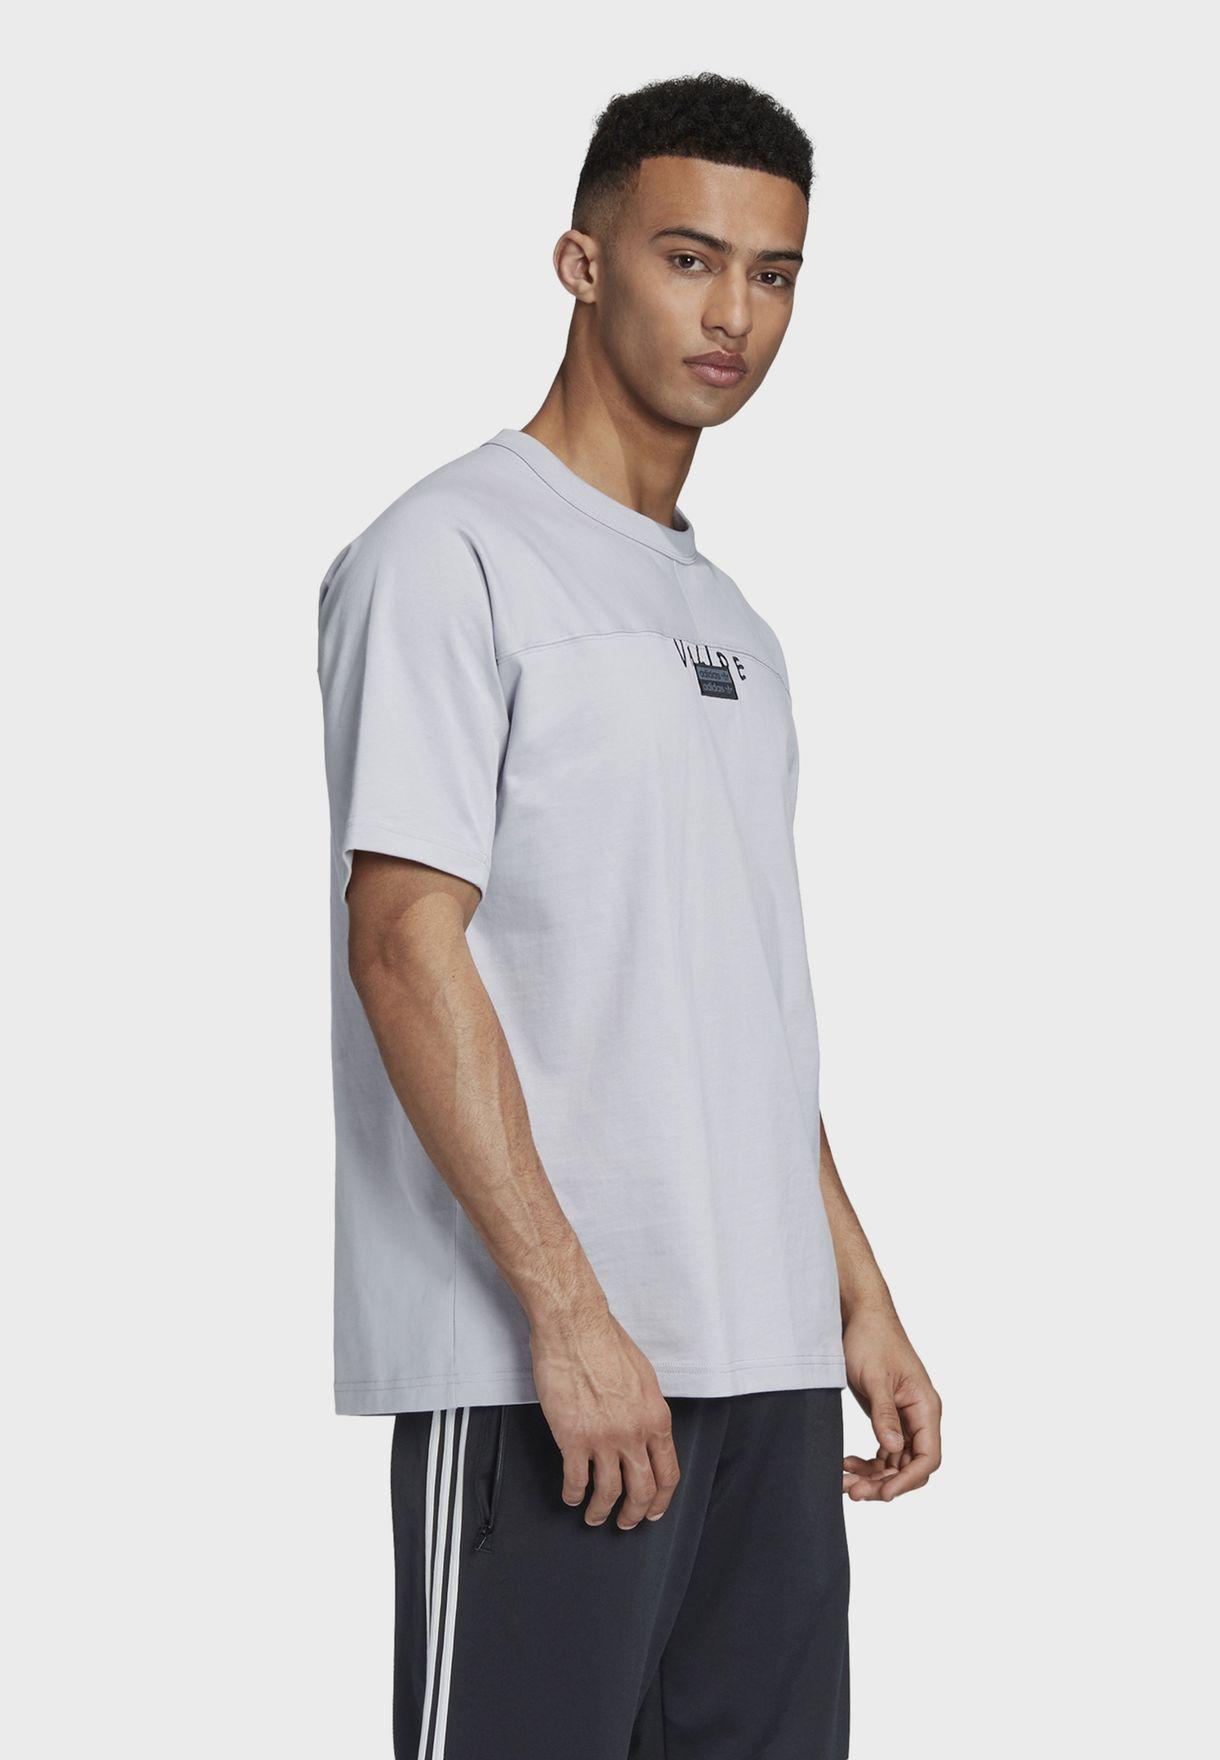 R.Y.V. Casual Men's T-Shirt